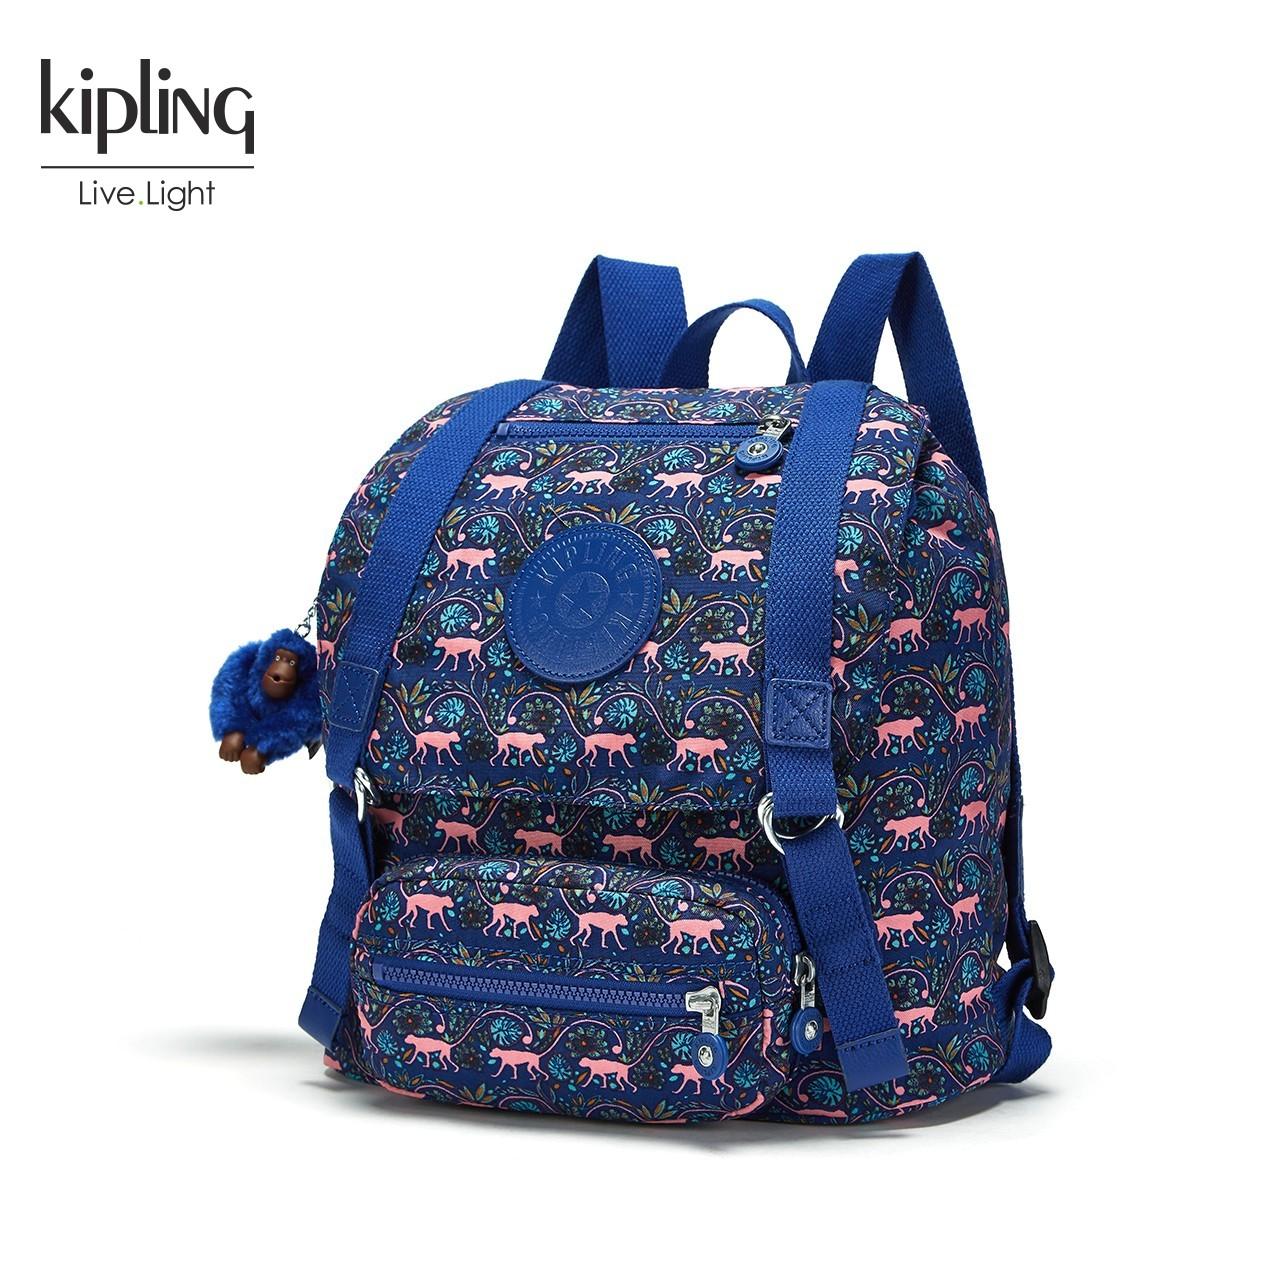 Kipling凯浦林官网包包女2018新款双肩包印花休闲潮款背包